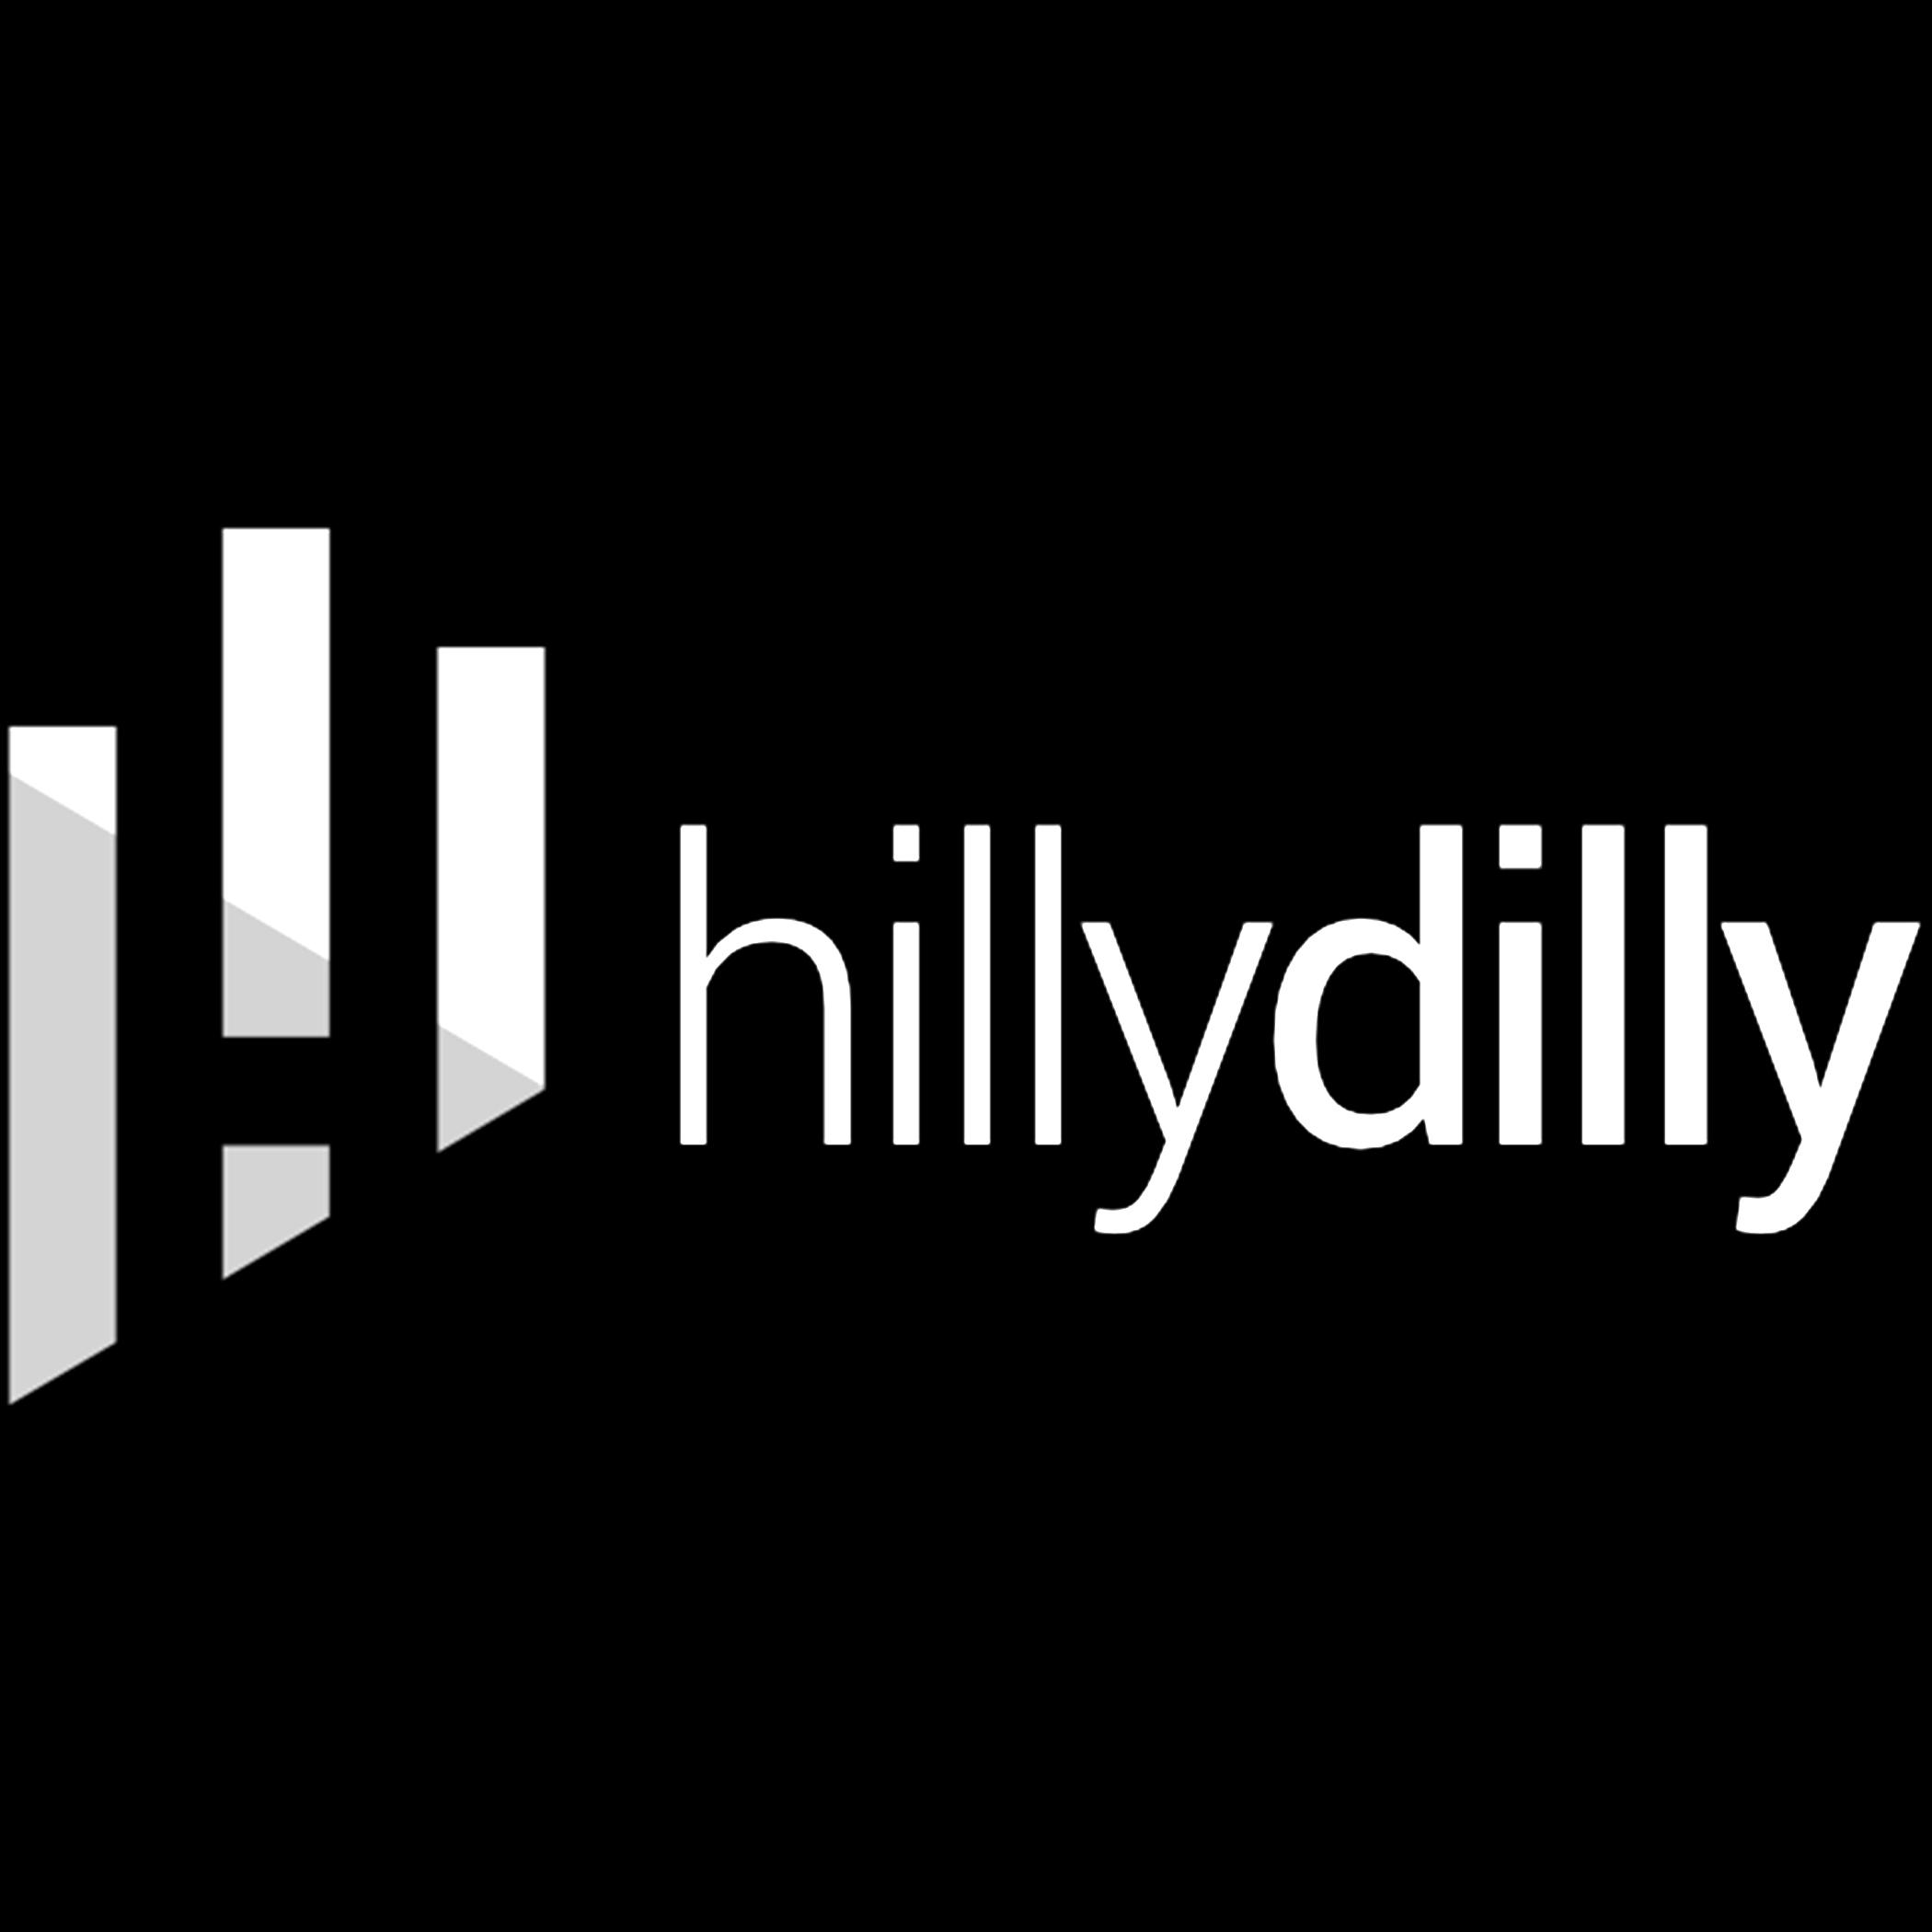 hillydilly.jpg